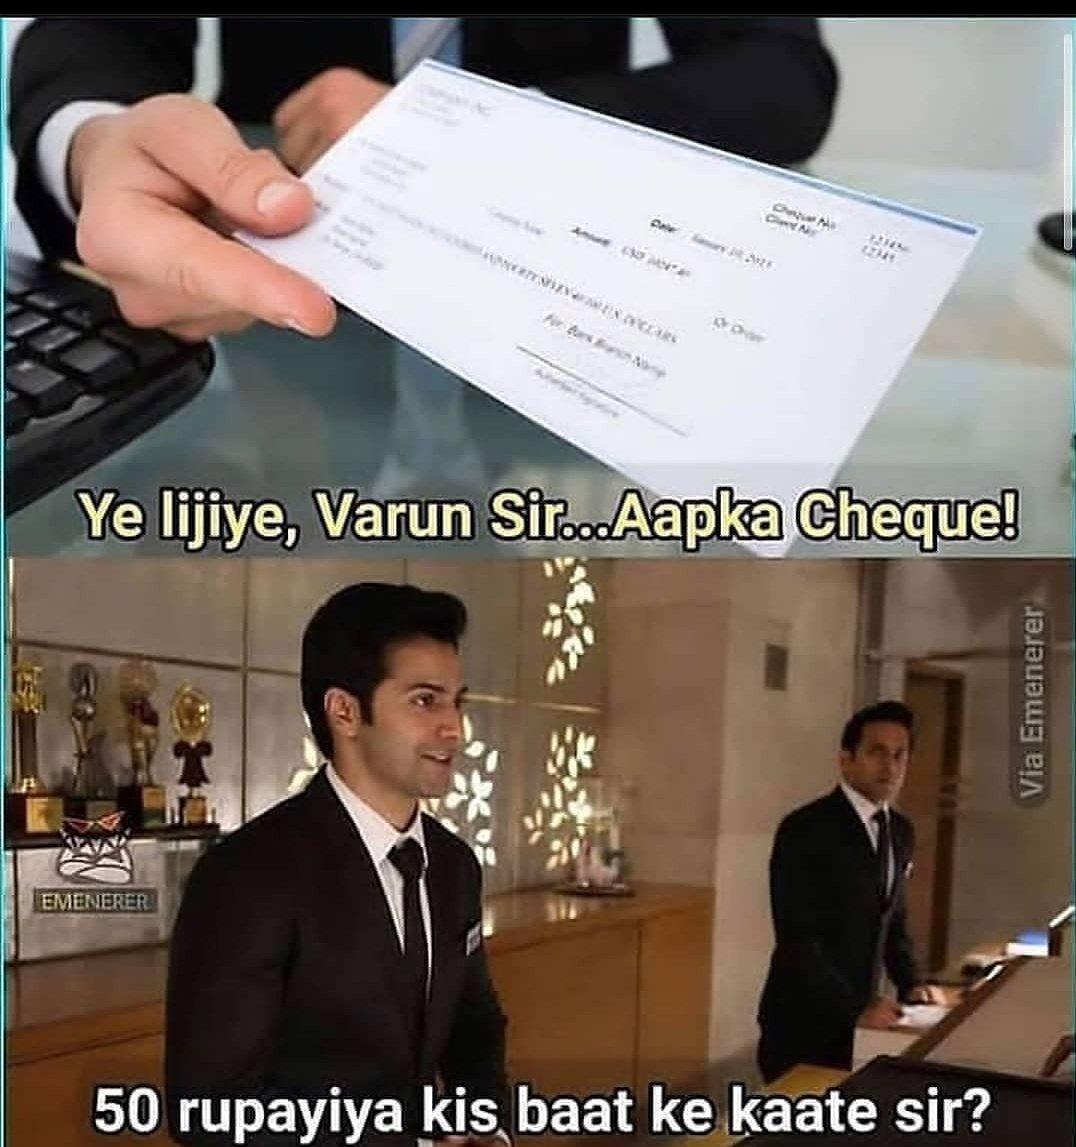 #varundhawan #coolieno1 #coolieno1onprime #Memes #memesdaily #memes2021 #meme